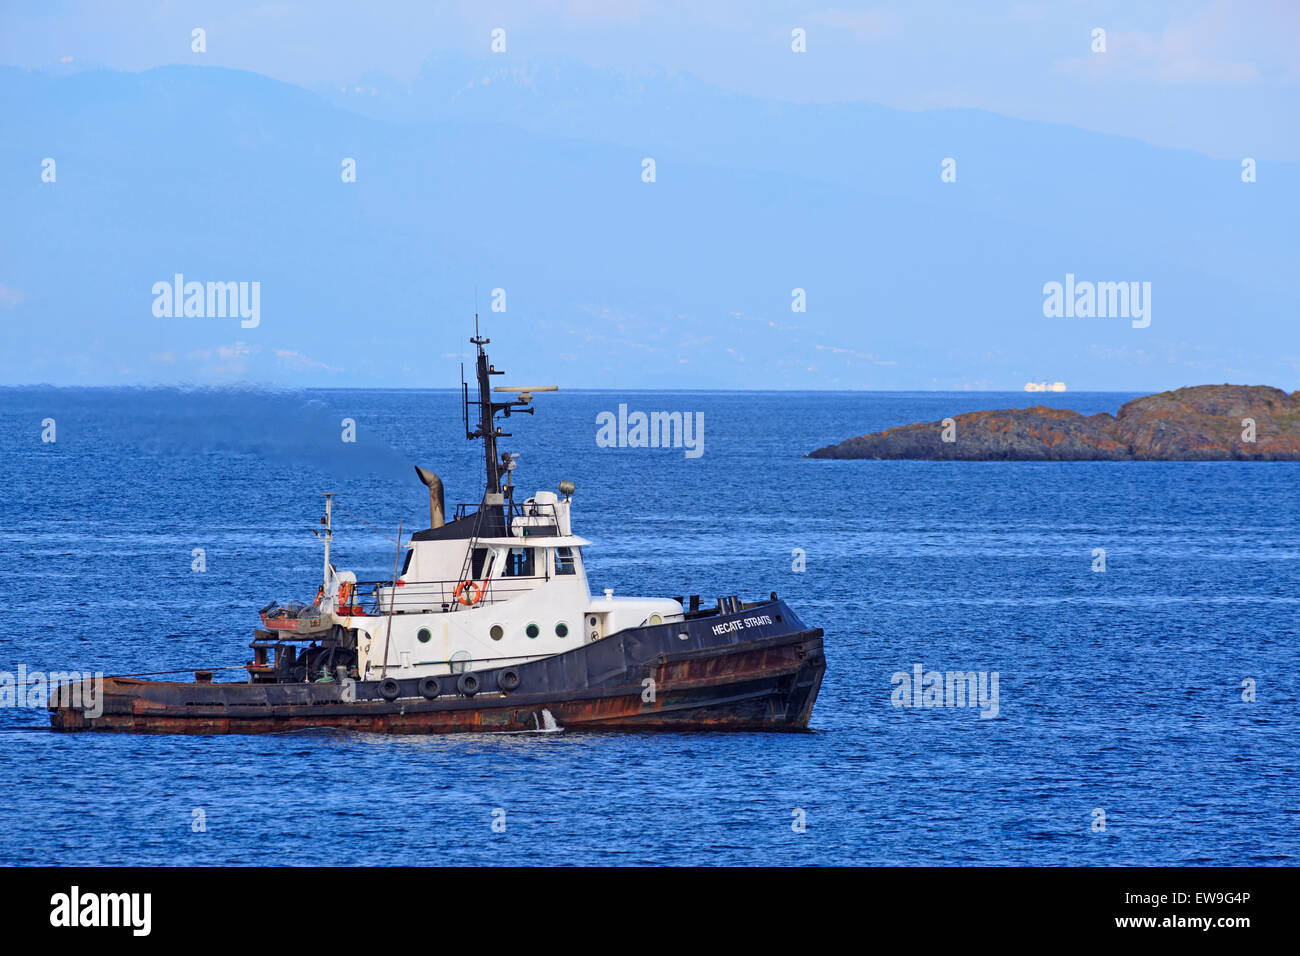 Tugboat pulling log boom in Georgia Strait, just north of Nanaimo, British Columbia - Stock Image